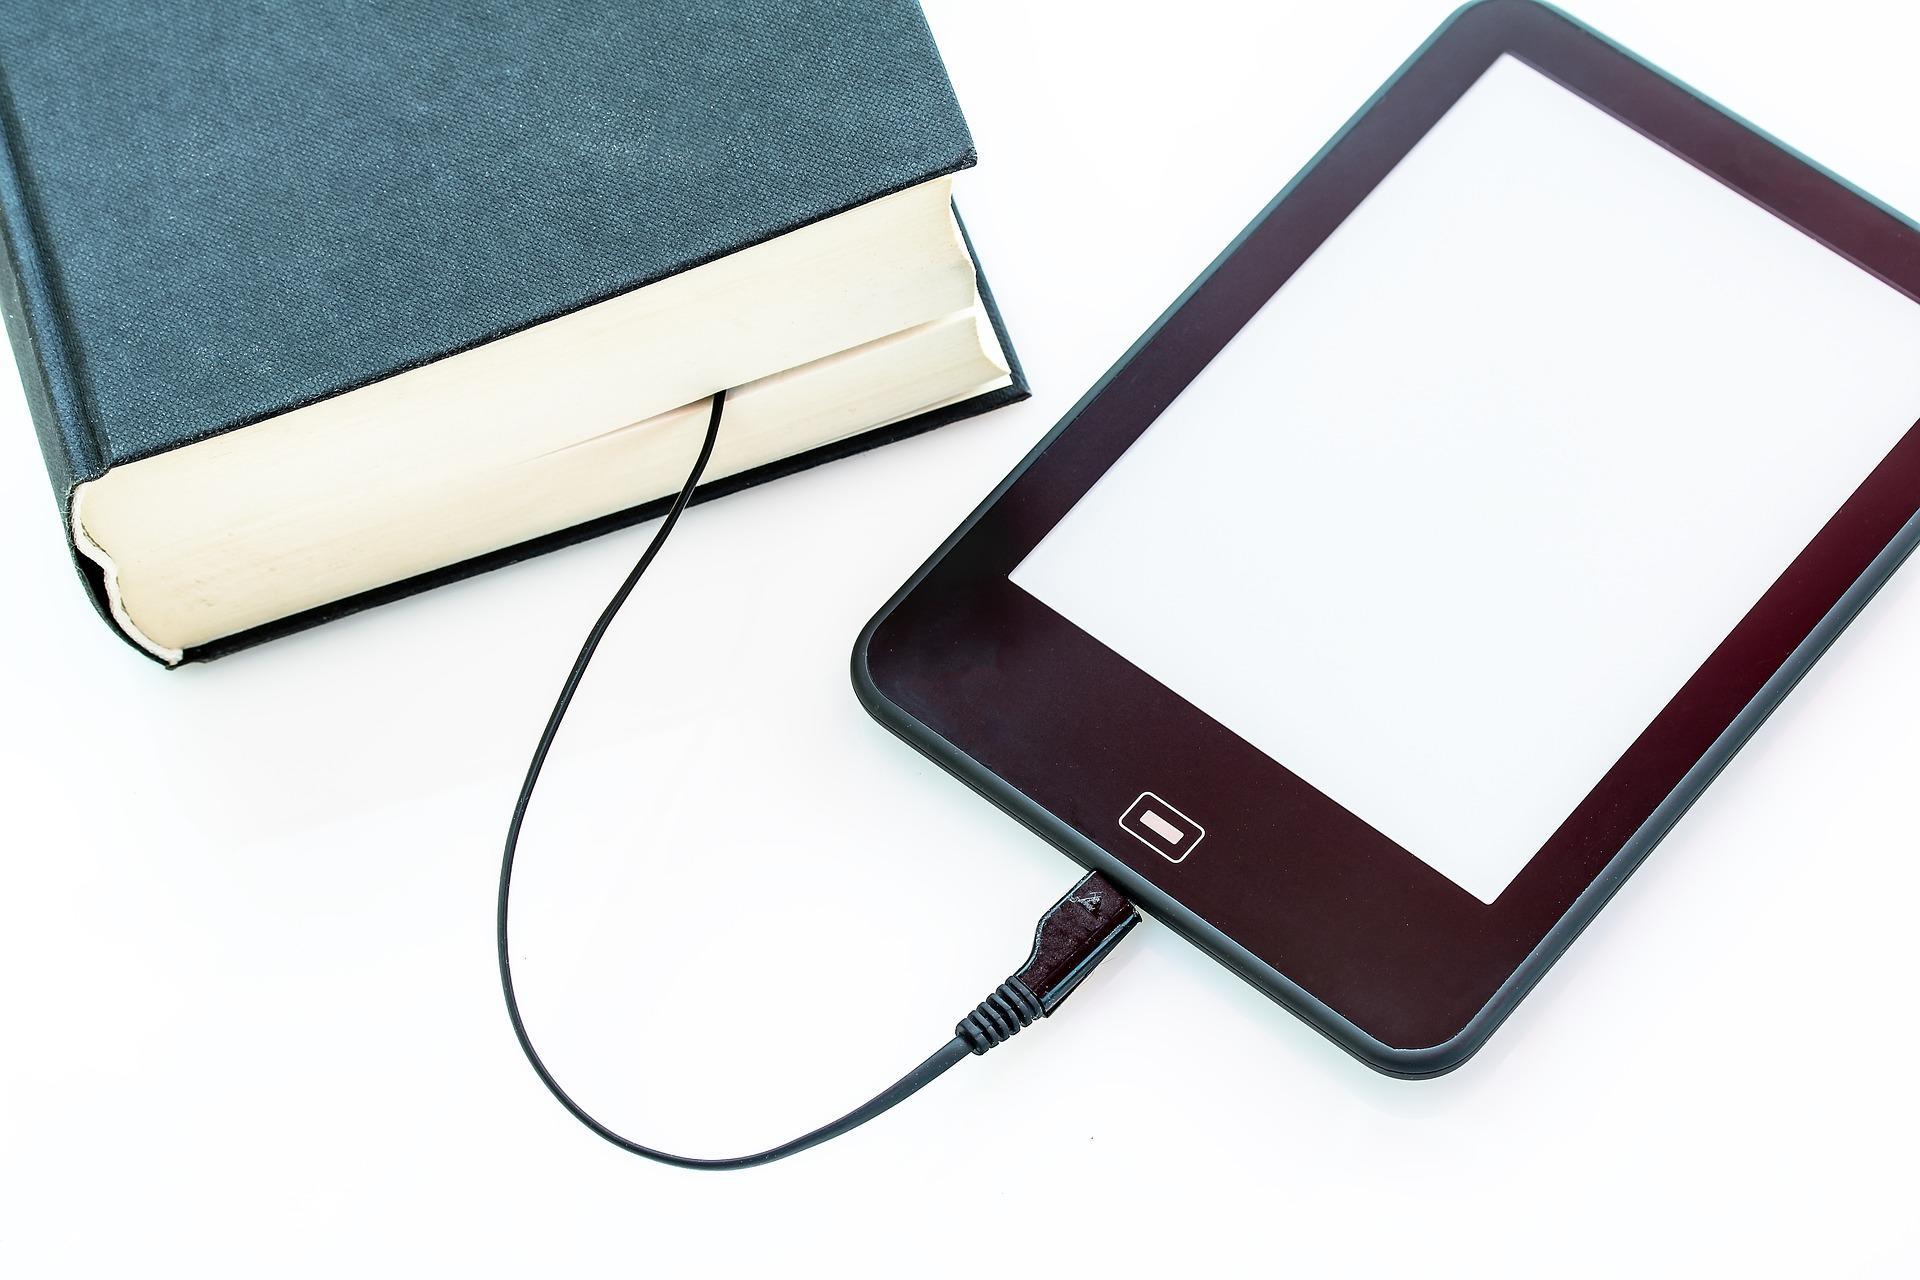 Self Publishing Tips: Print vs. Ebook or Both?